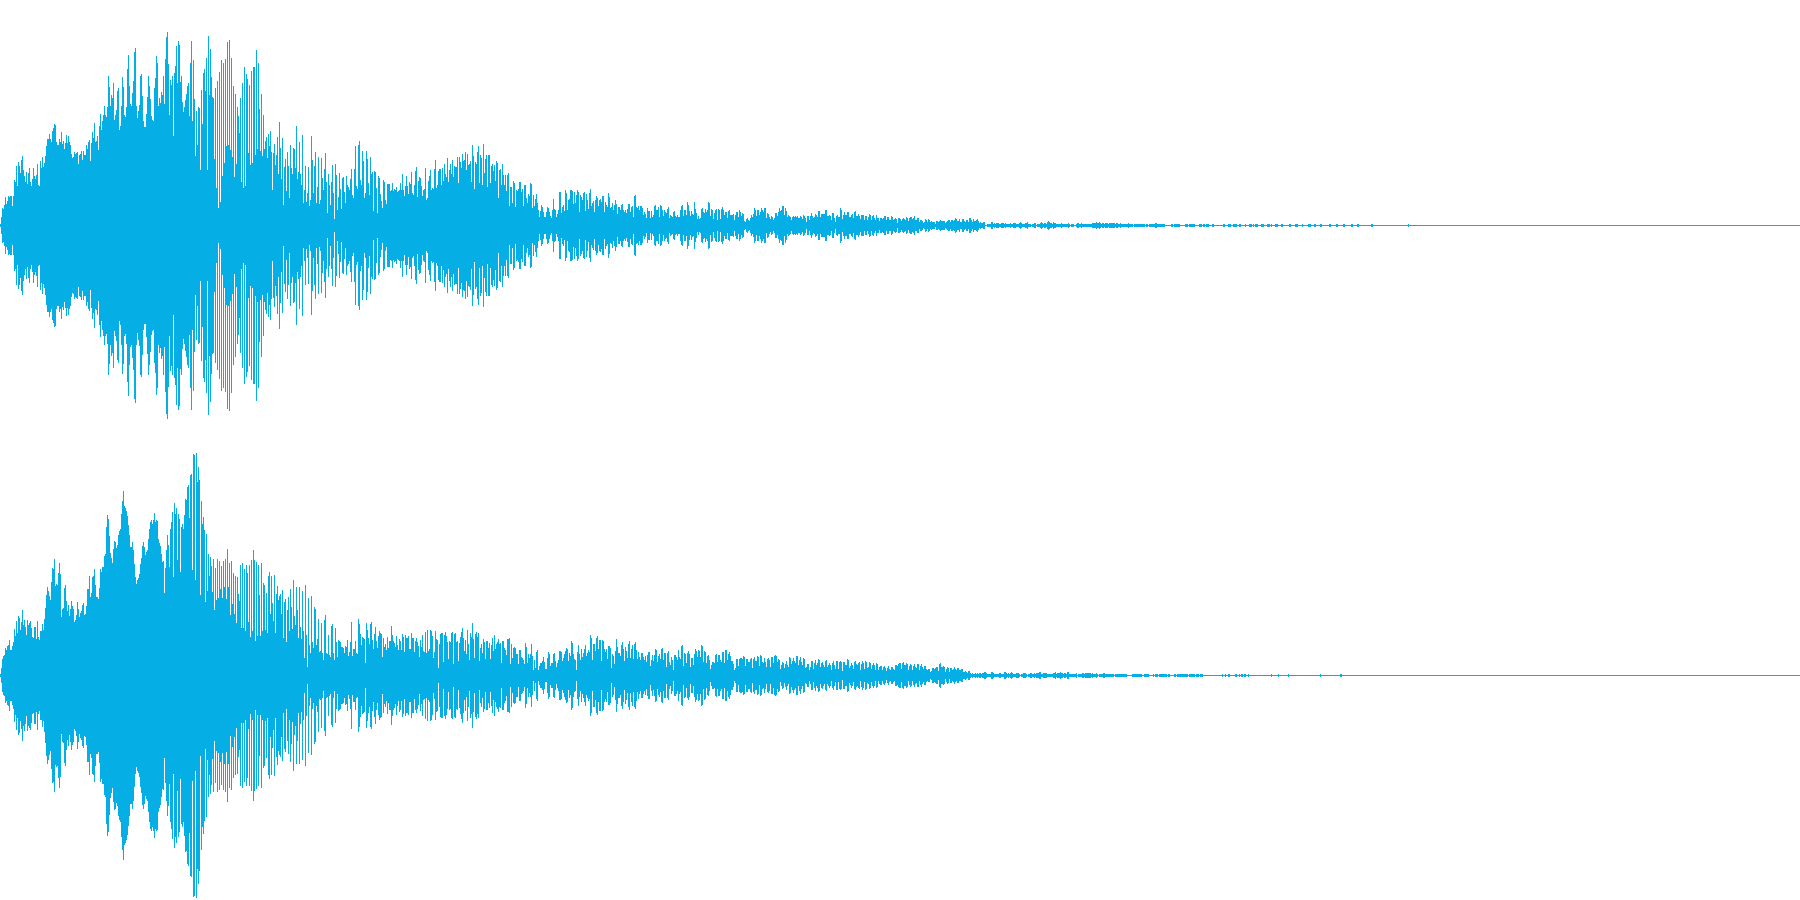 TV RADIO SFX10 チェケラ!の再生済みの波形